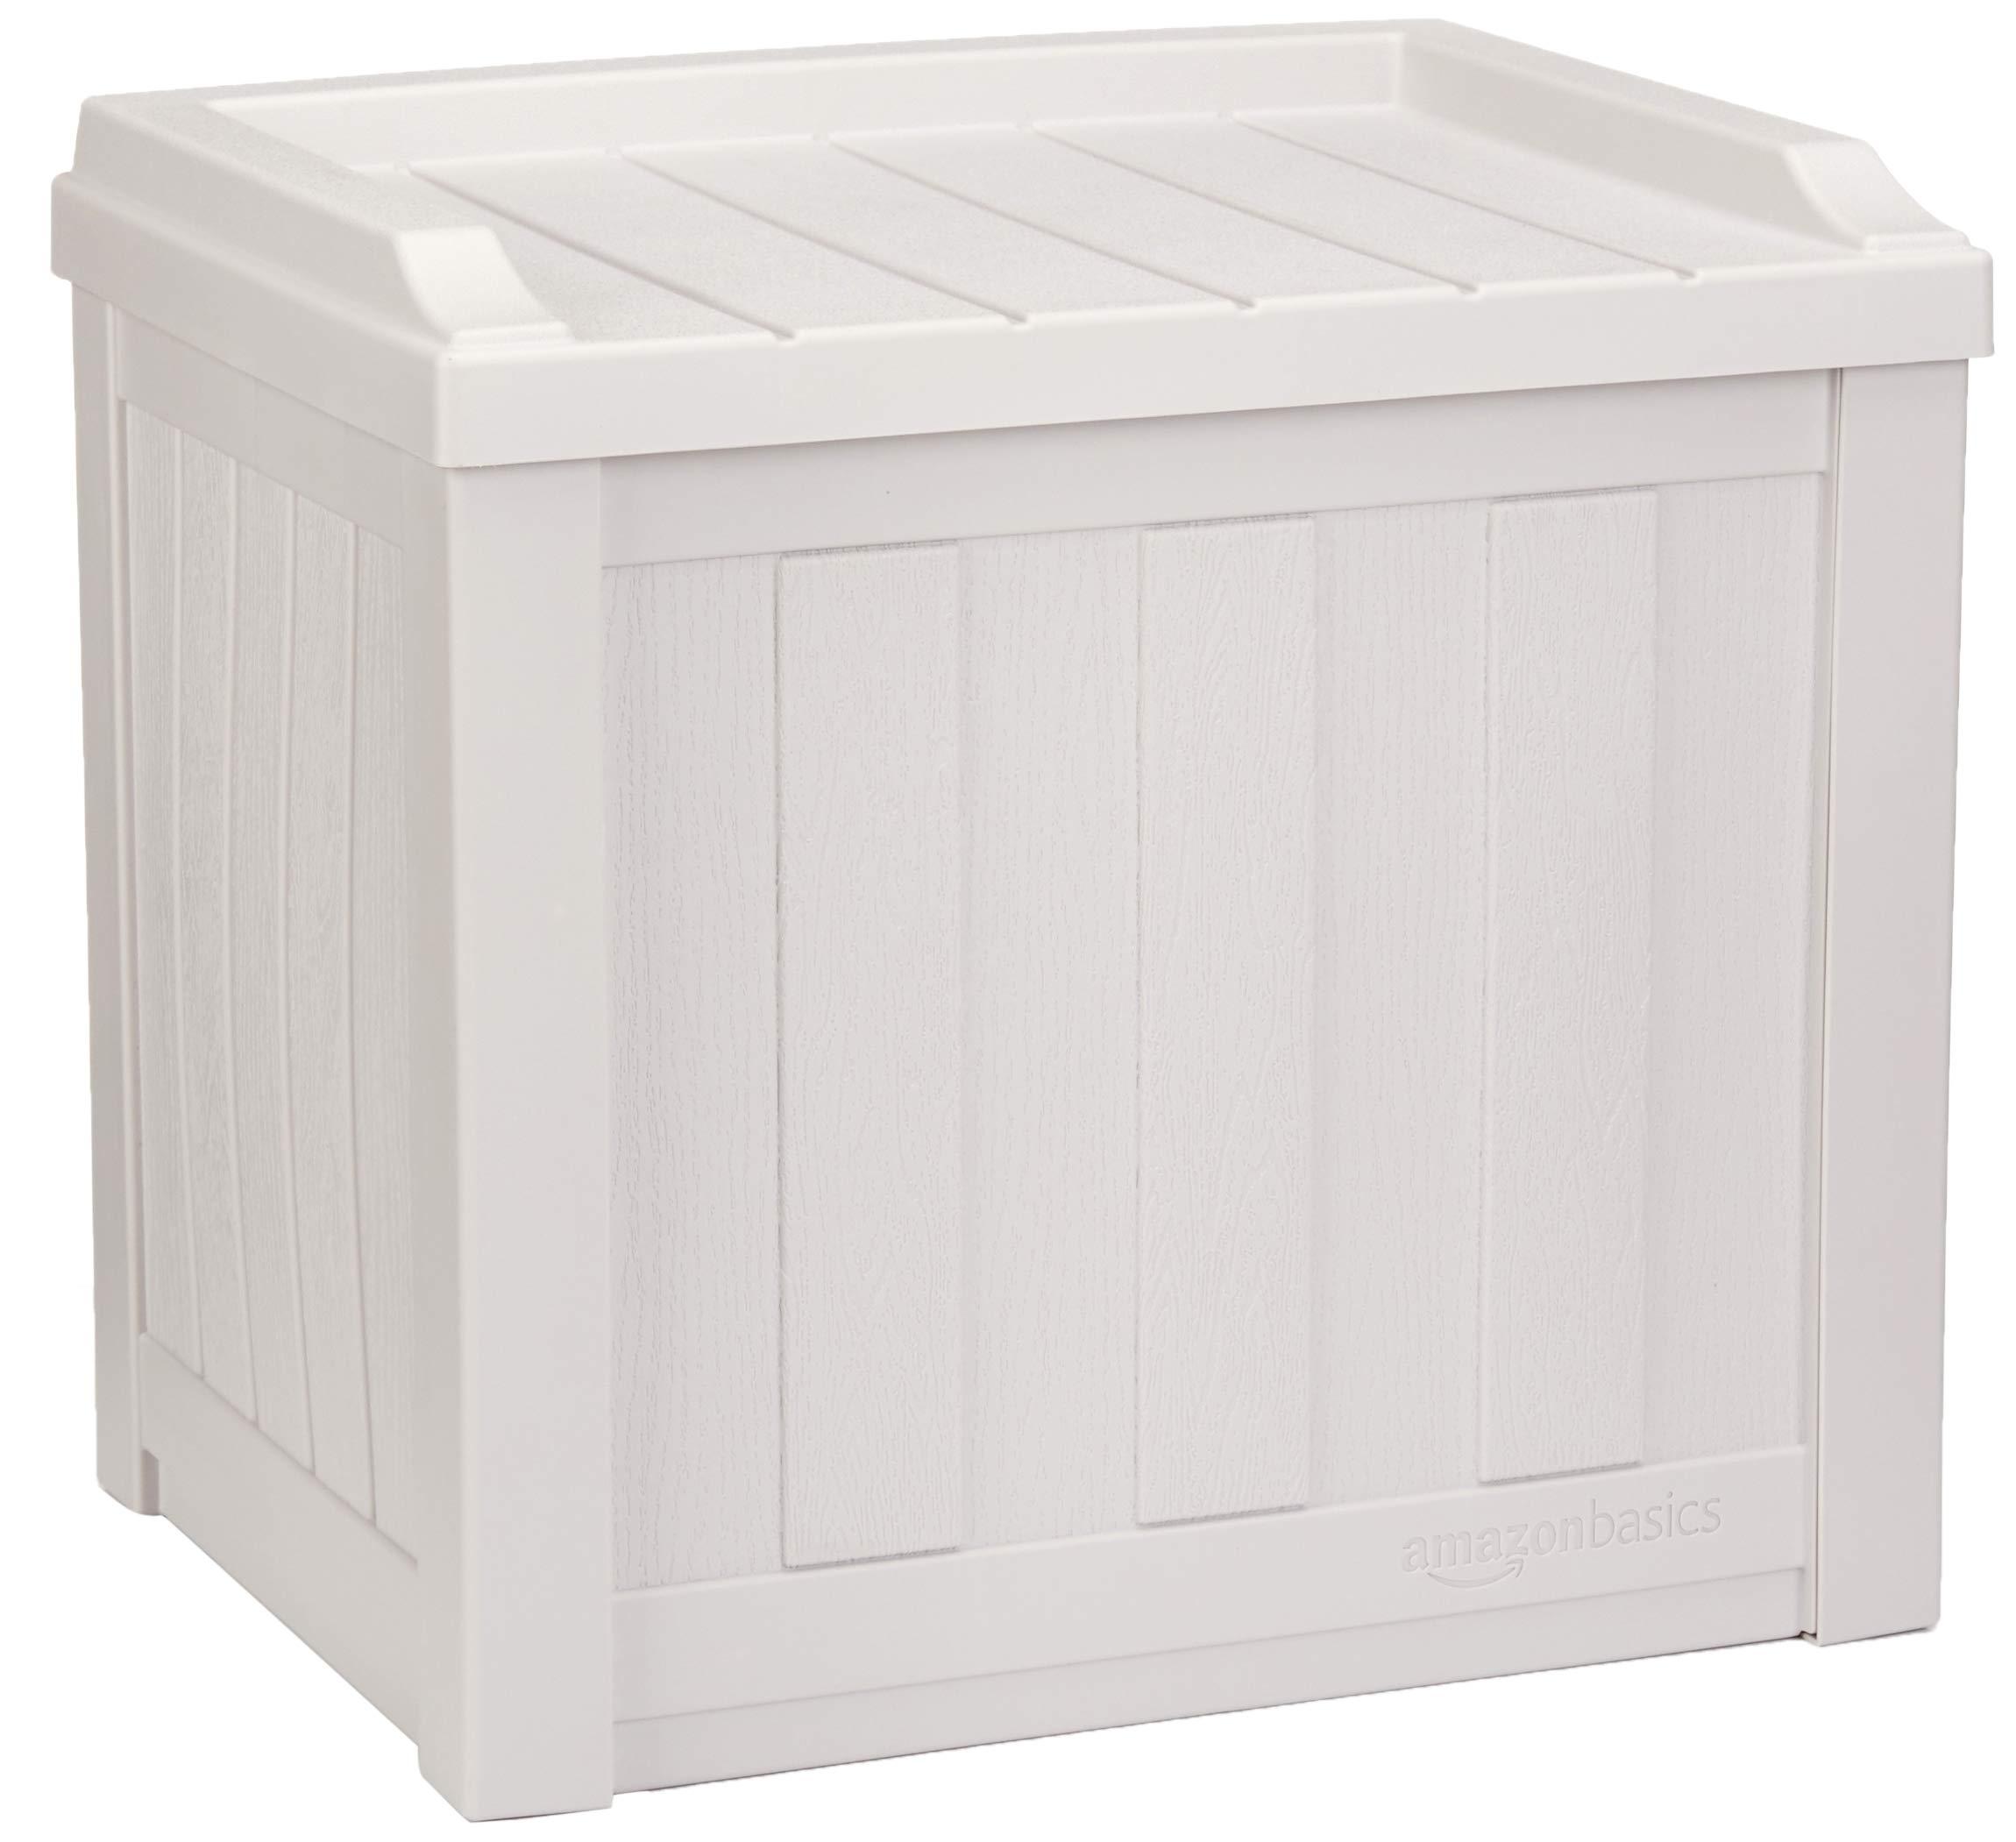 AmazonBasics 22-Gallon Resin Deck Storage Box, Grey by AmazonBasics